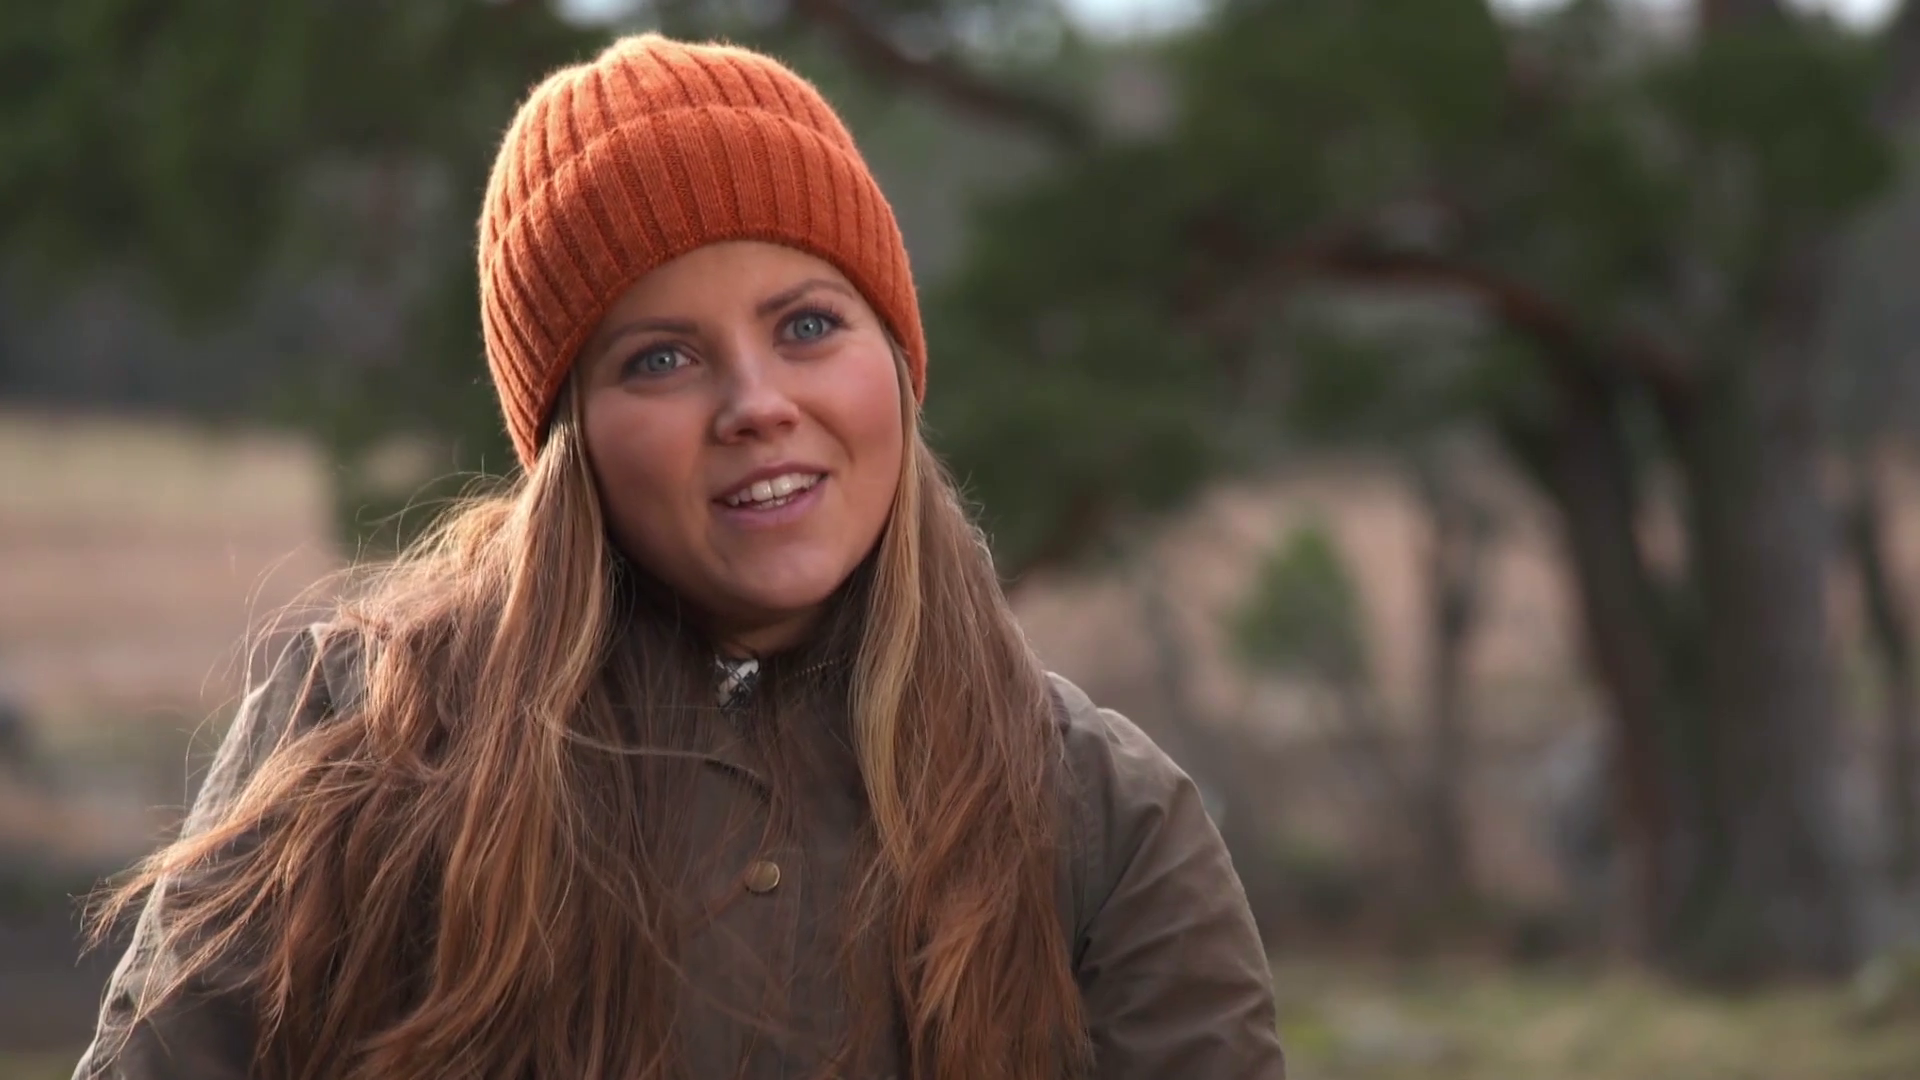 Ulrica Therese Wennerberg, Bjrkviksvgen 38, Frentuna